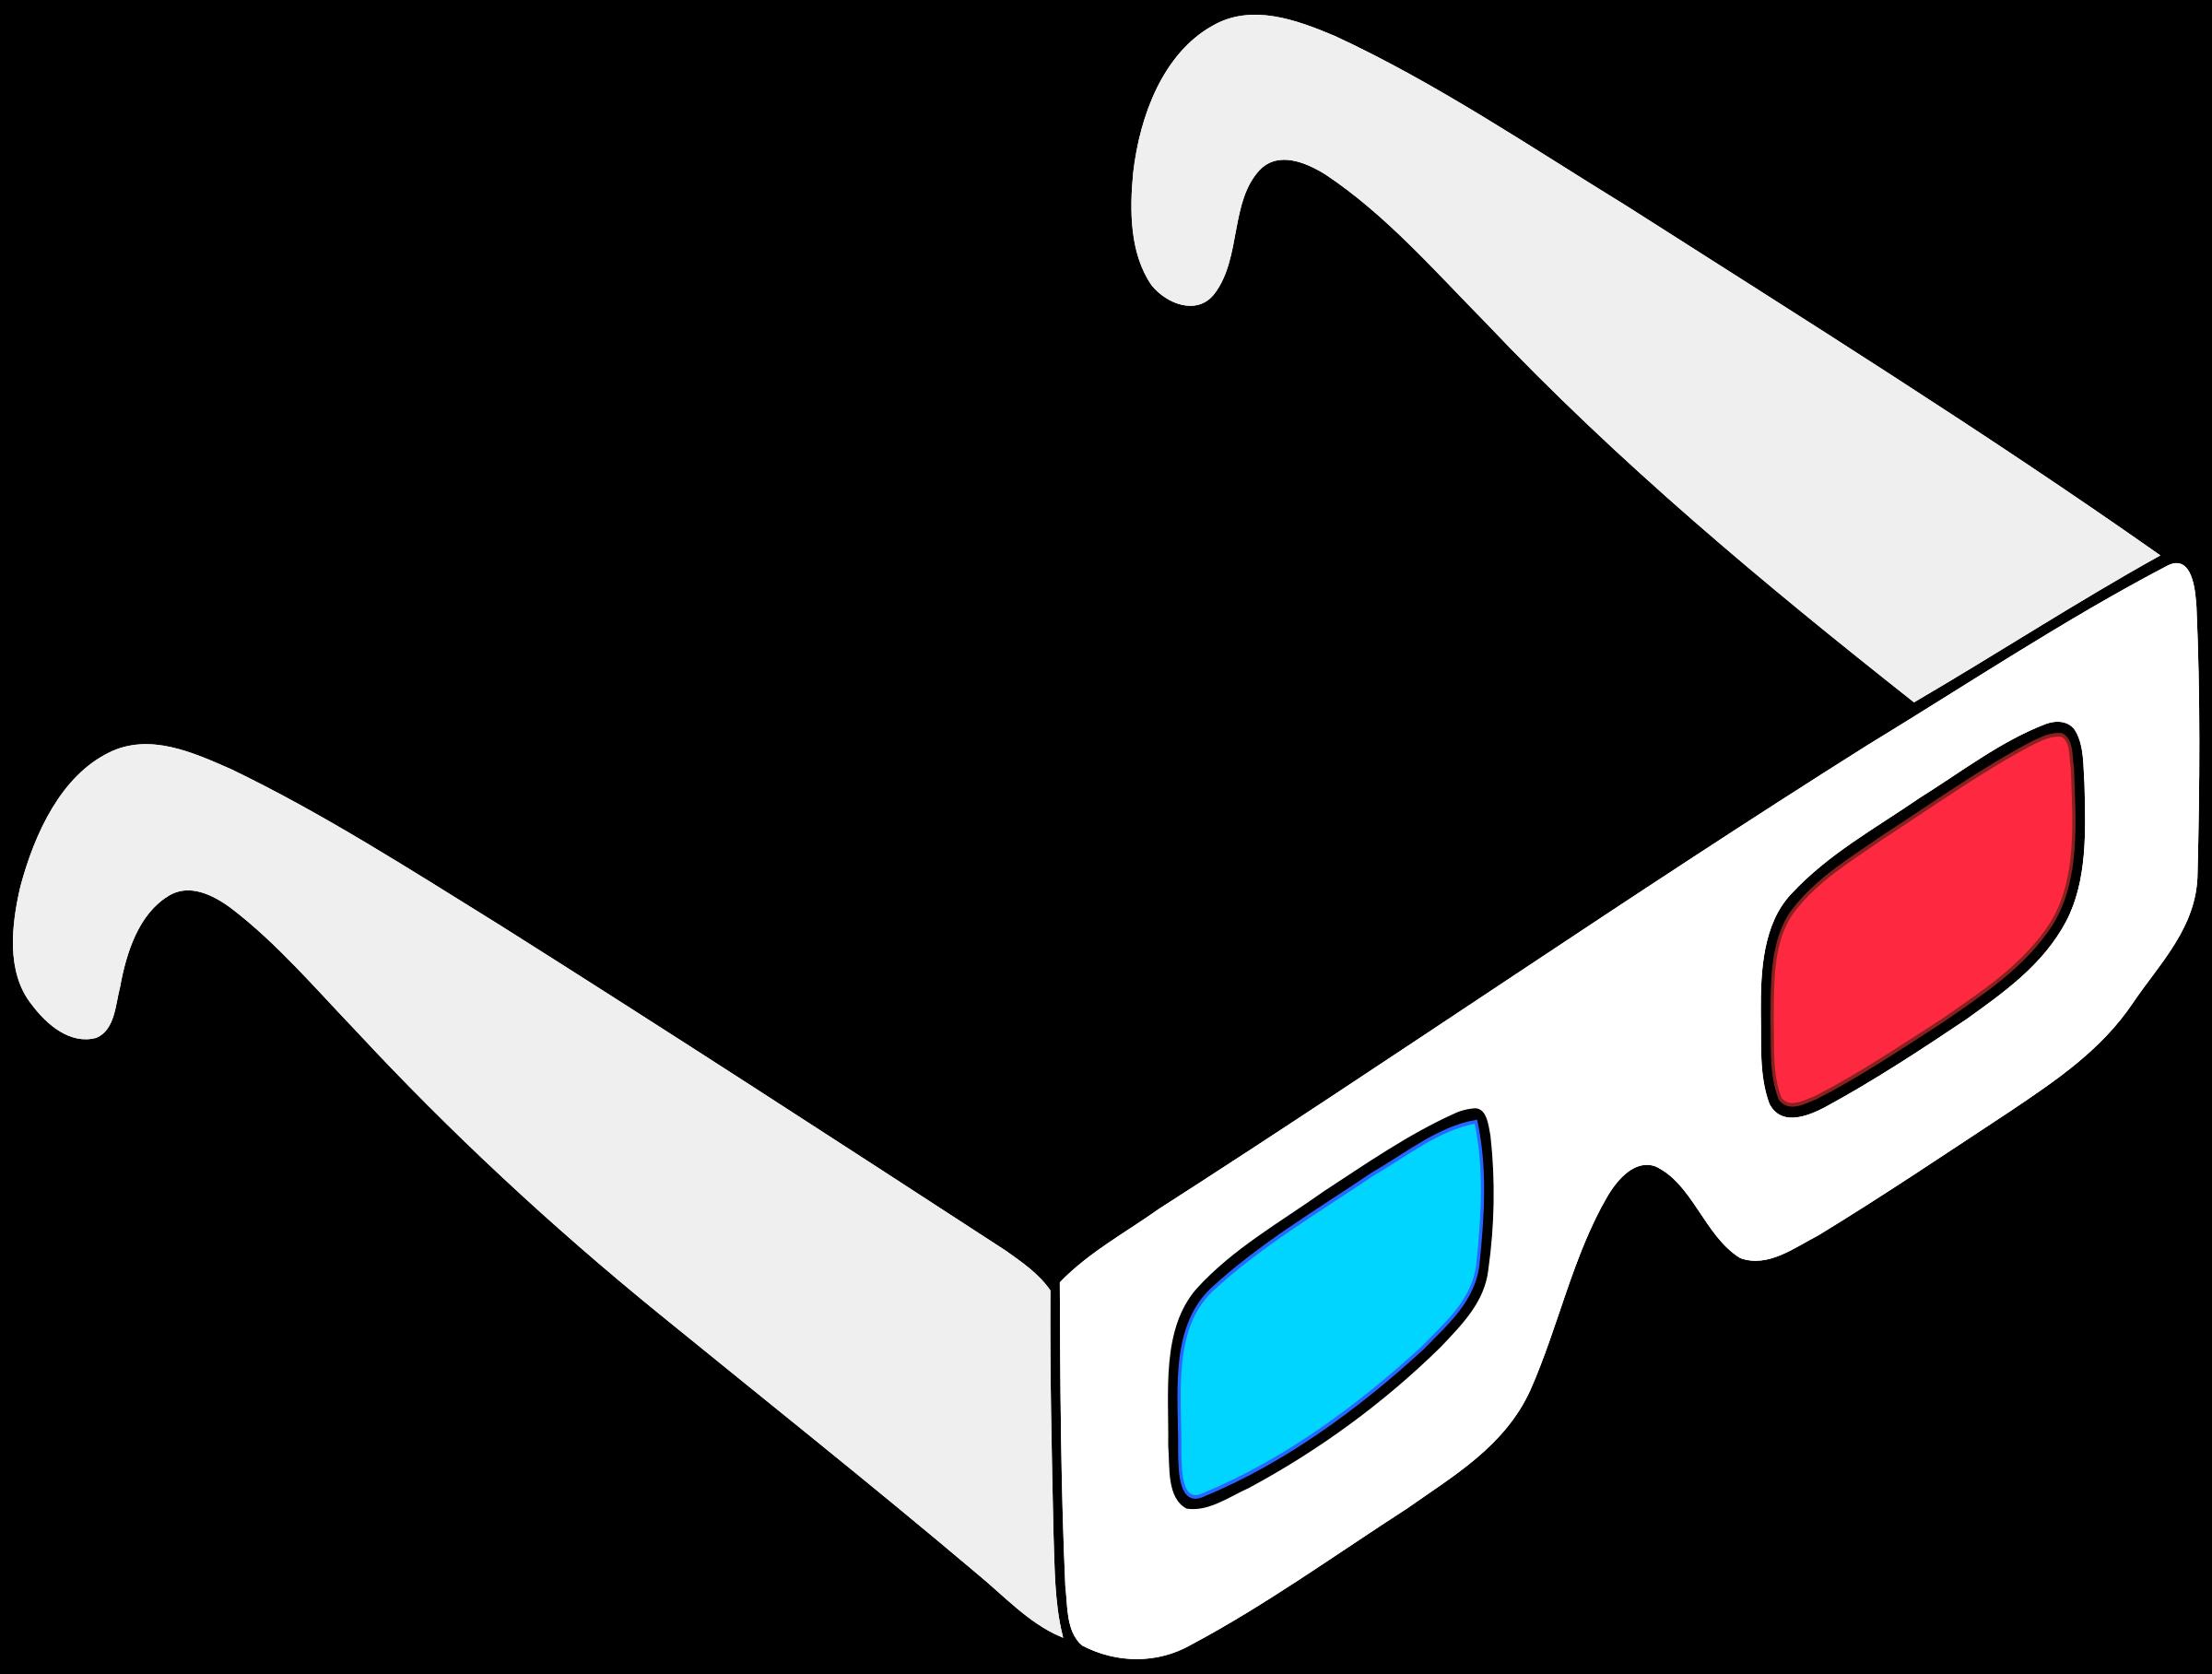 Clipart glasses movie, Clipart glasses movie Transparent.